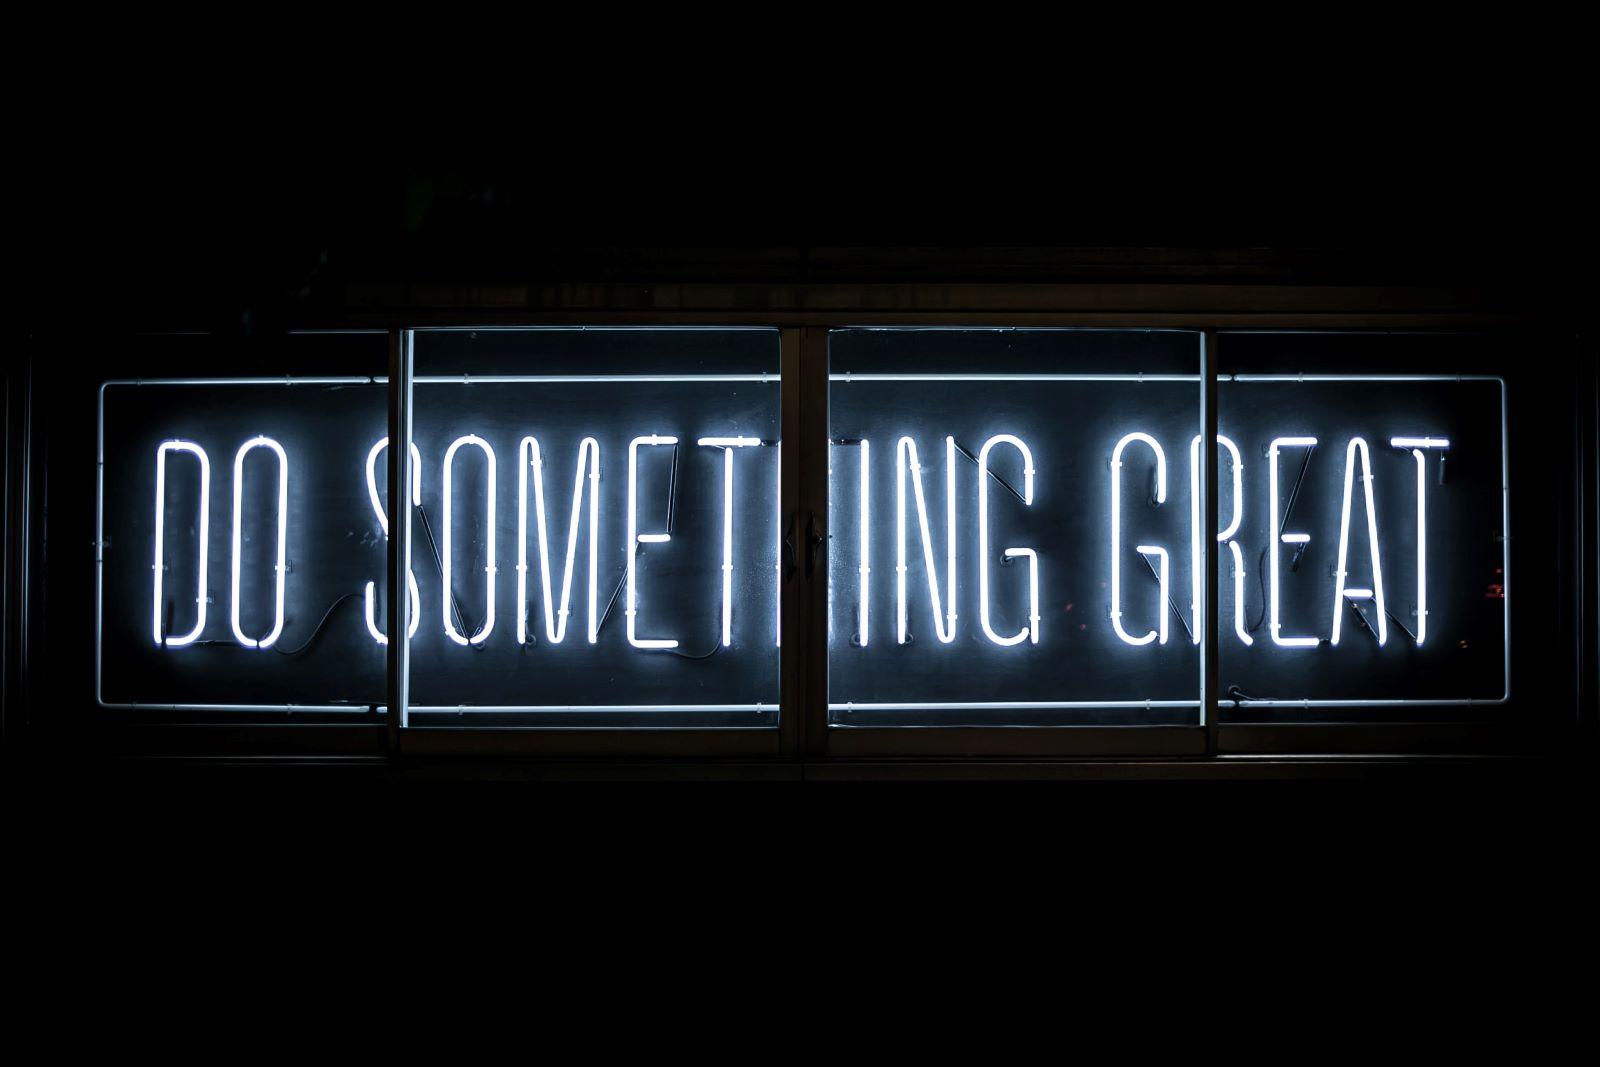 Neonletters met de tekst Do Something Great